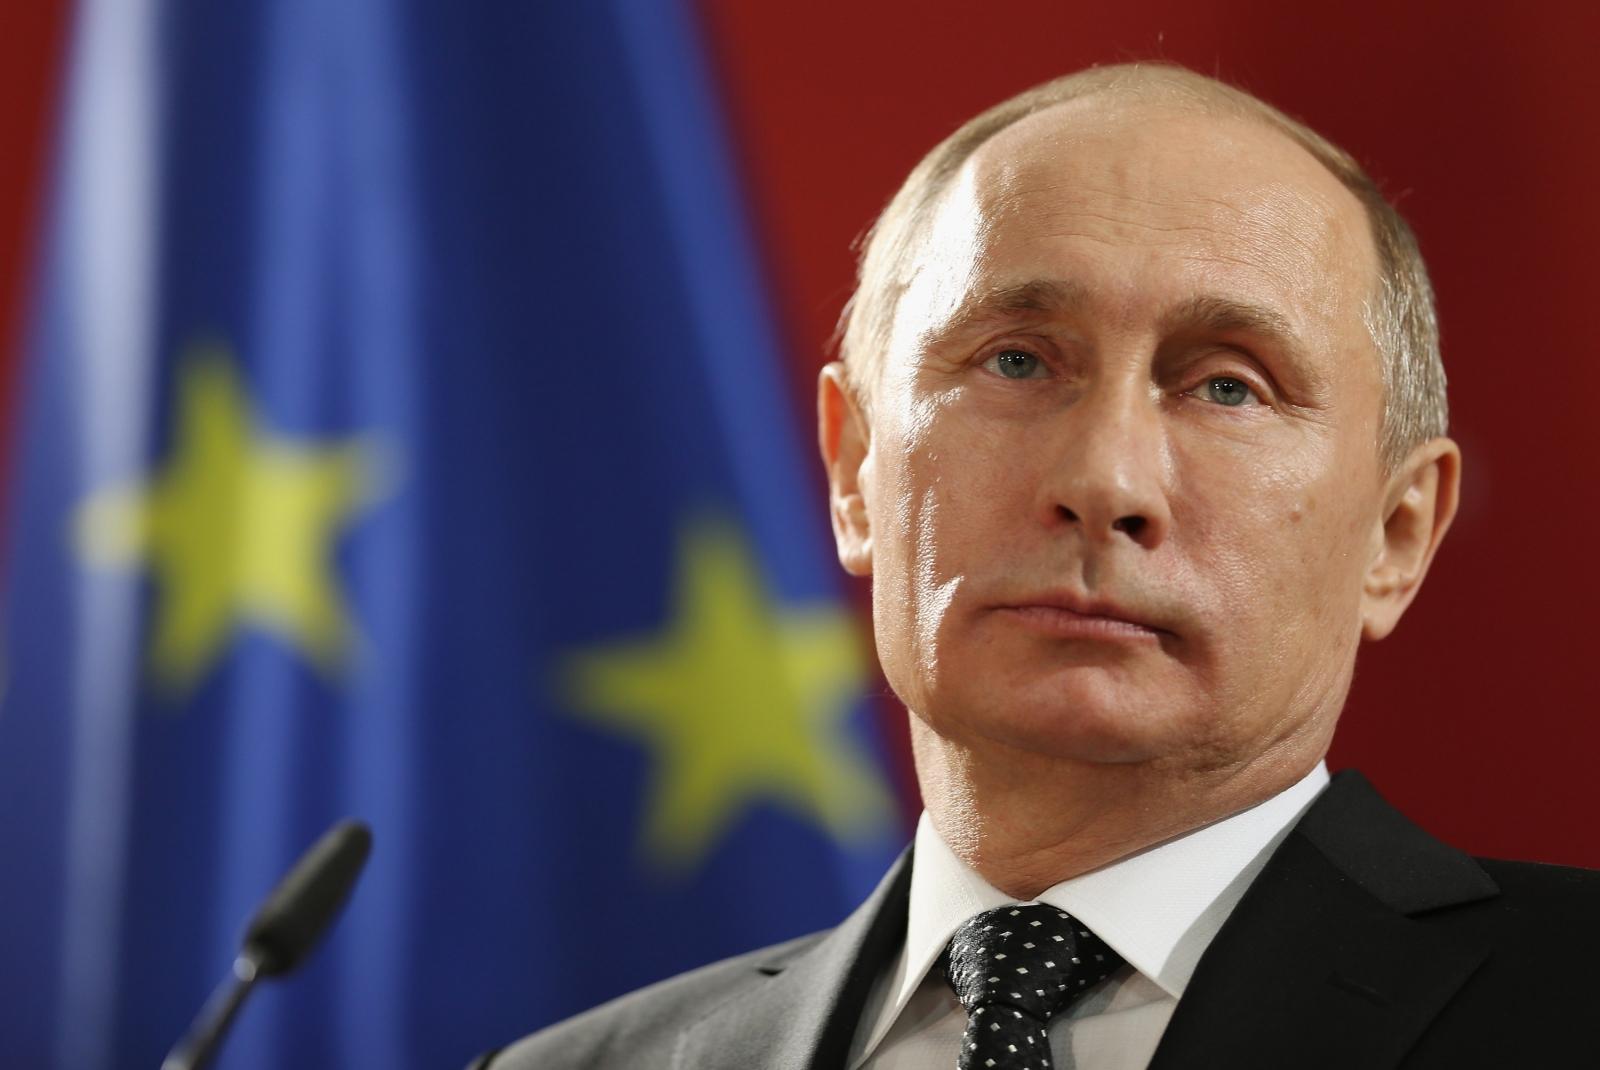 Russian president Vladimir Putin. (Getty)